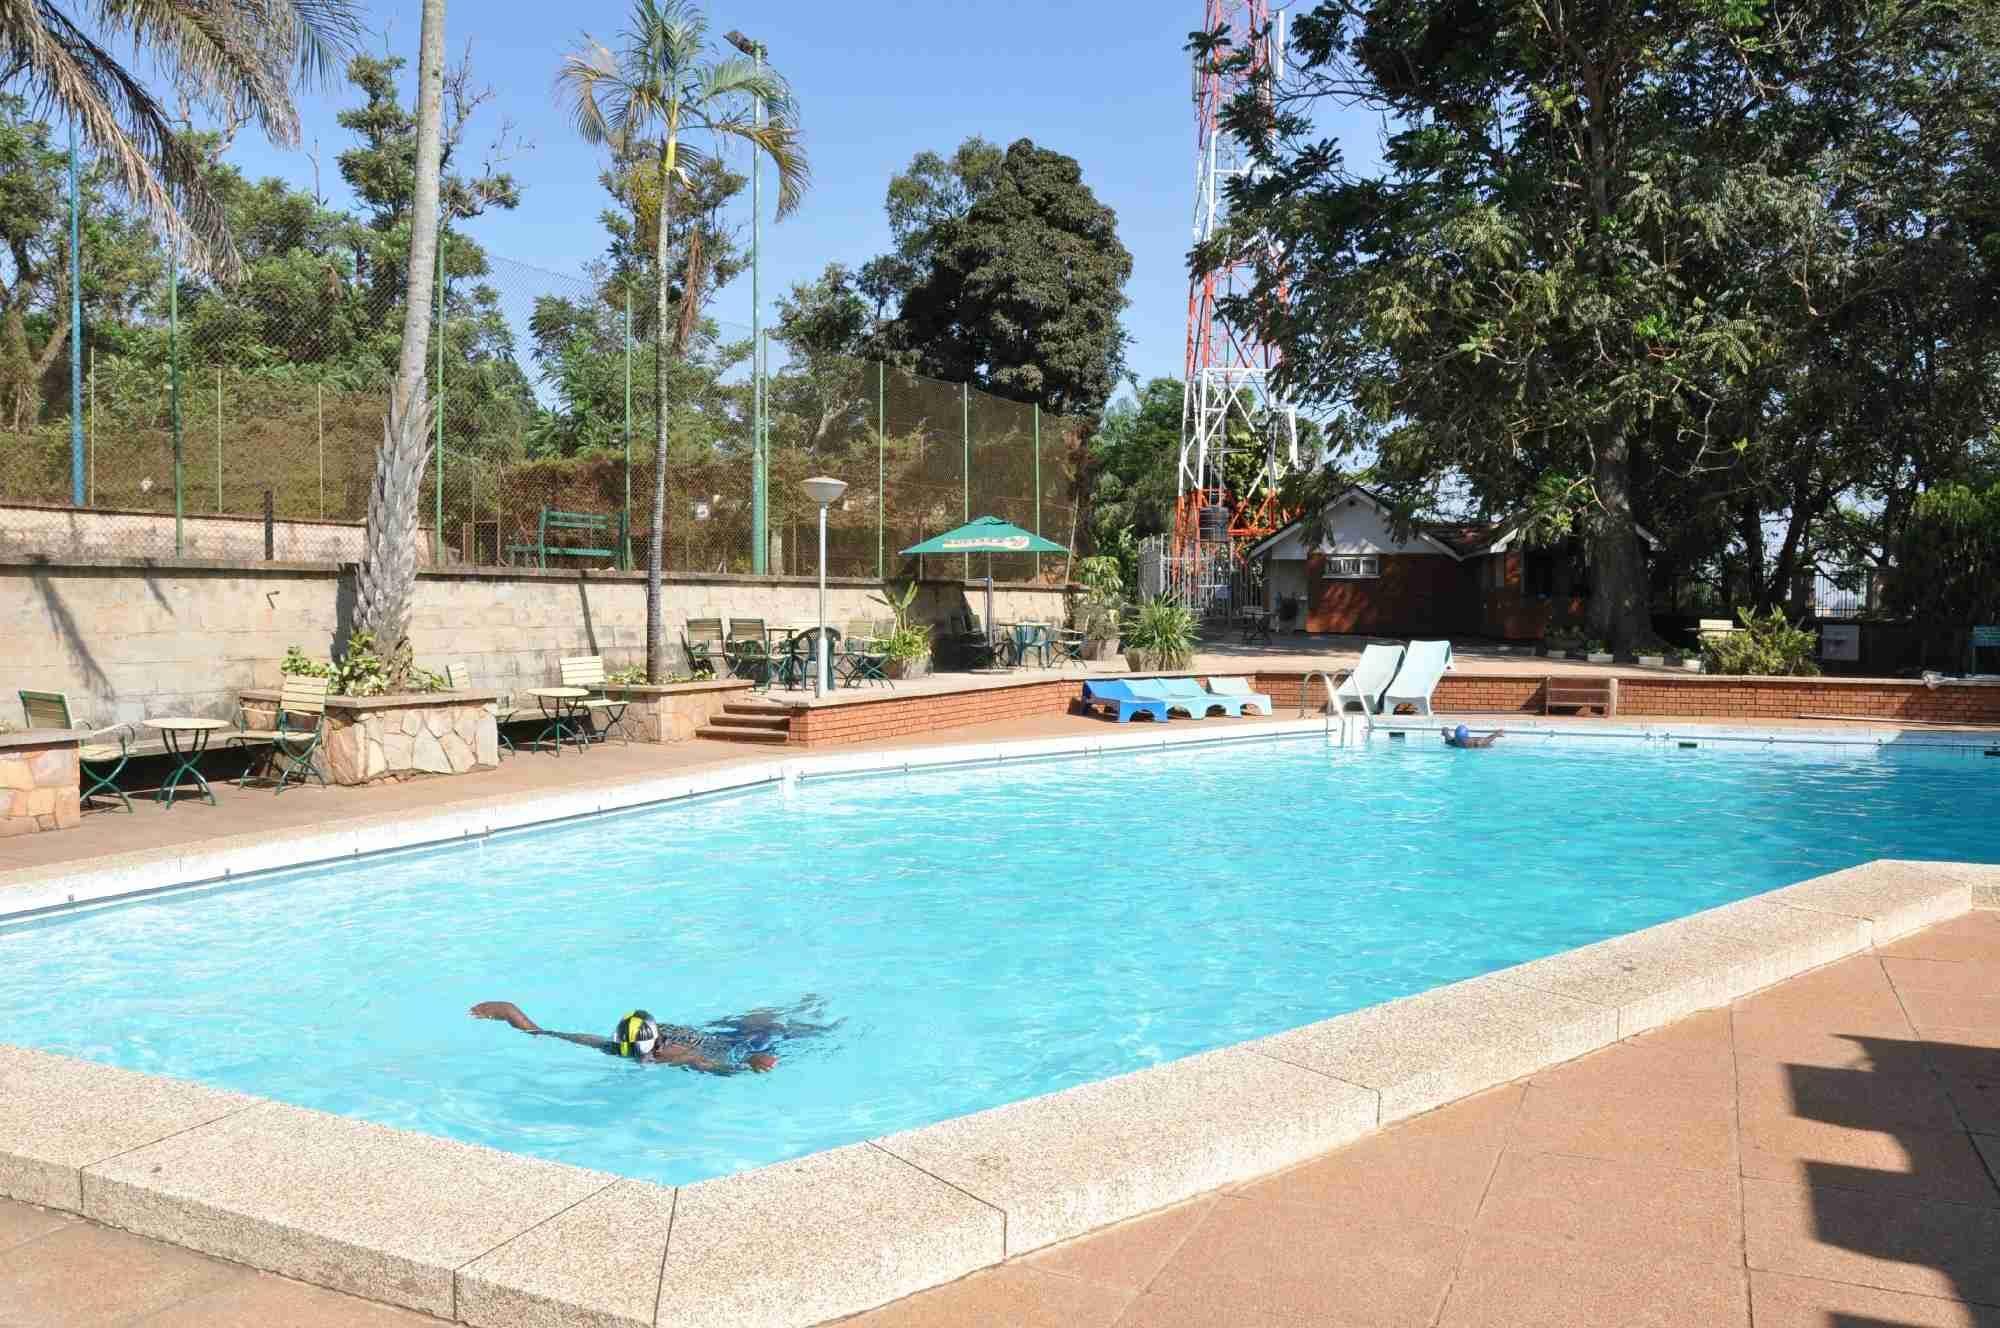 hotels Uganda